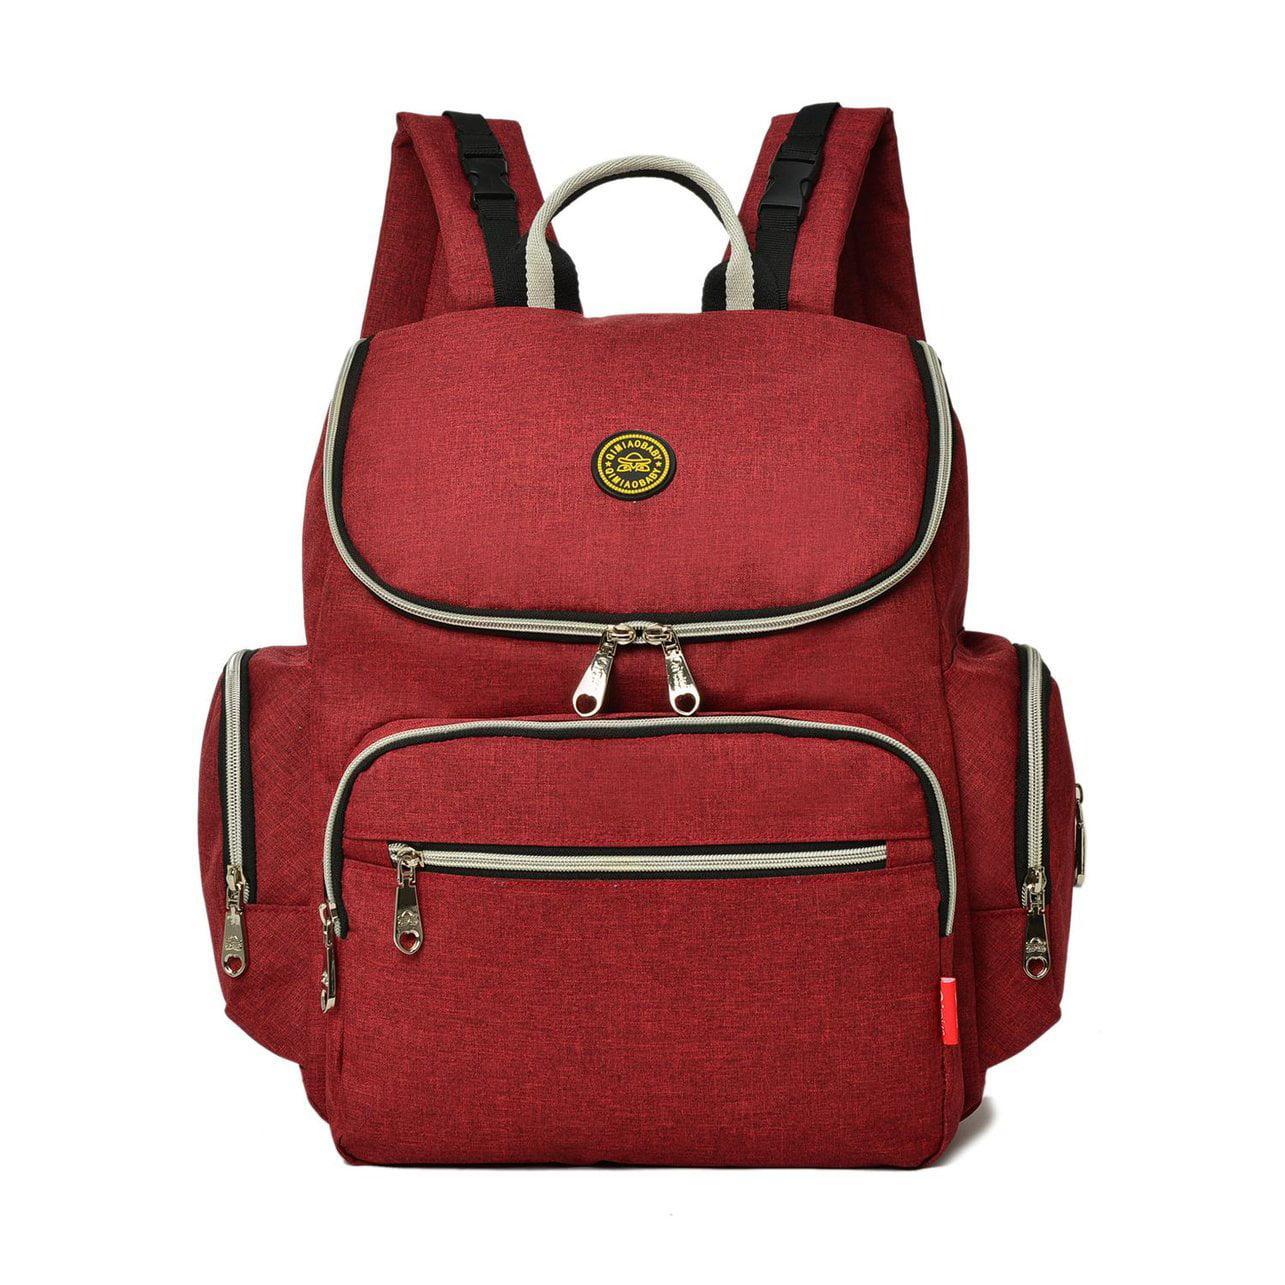 Baby Diaper Bag Mommy Bag Travel Backpack With Stroller Straps Shoulder Bag by OUTAD